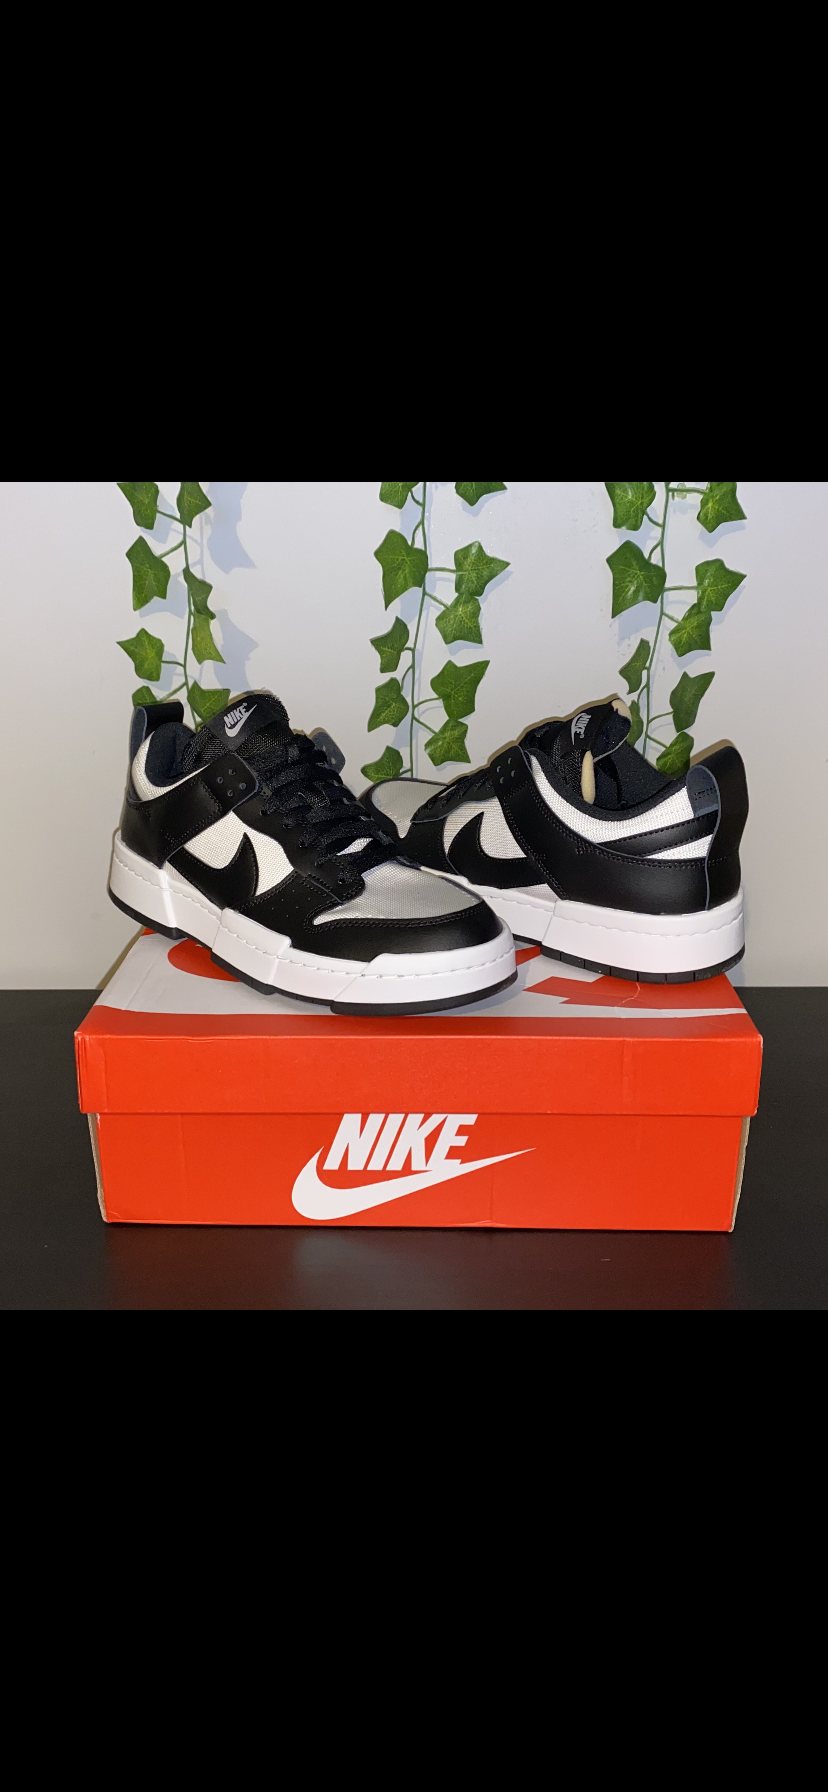 Nike dunk Low disrupt black/white